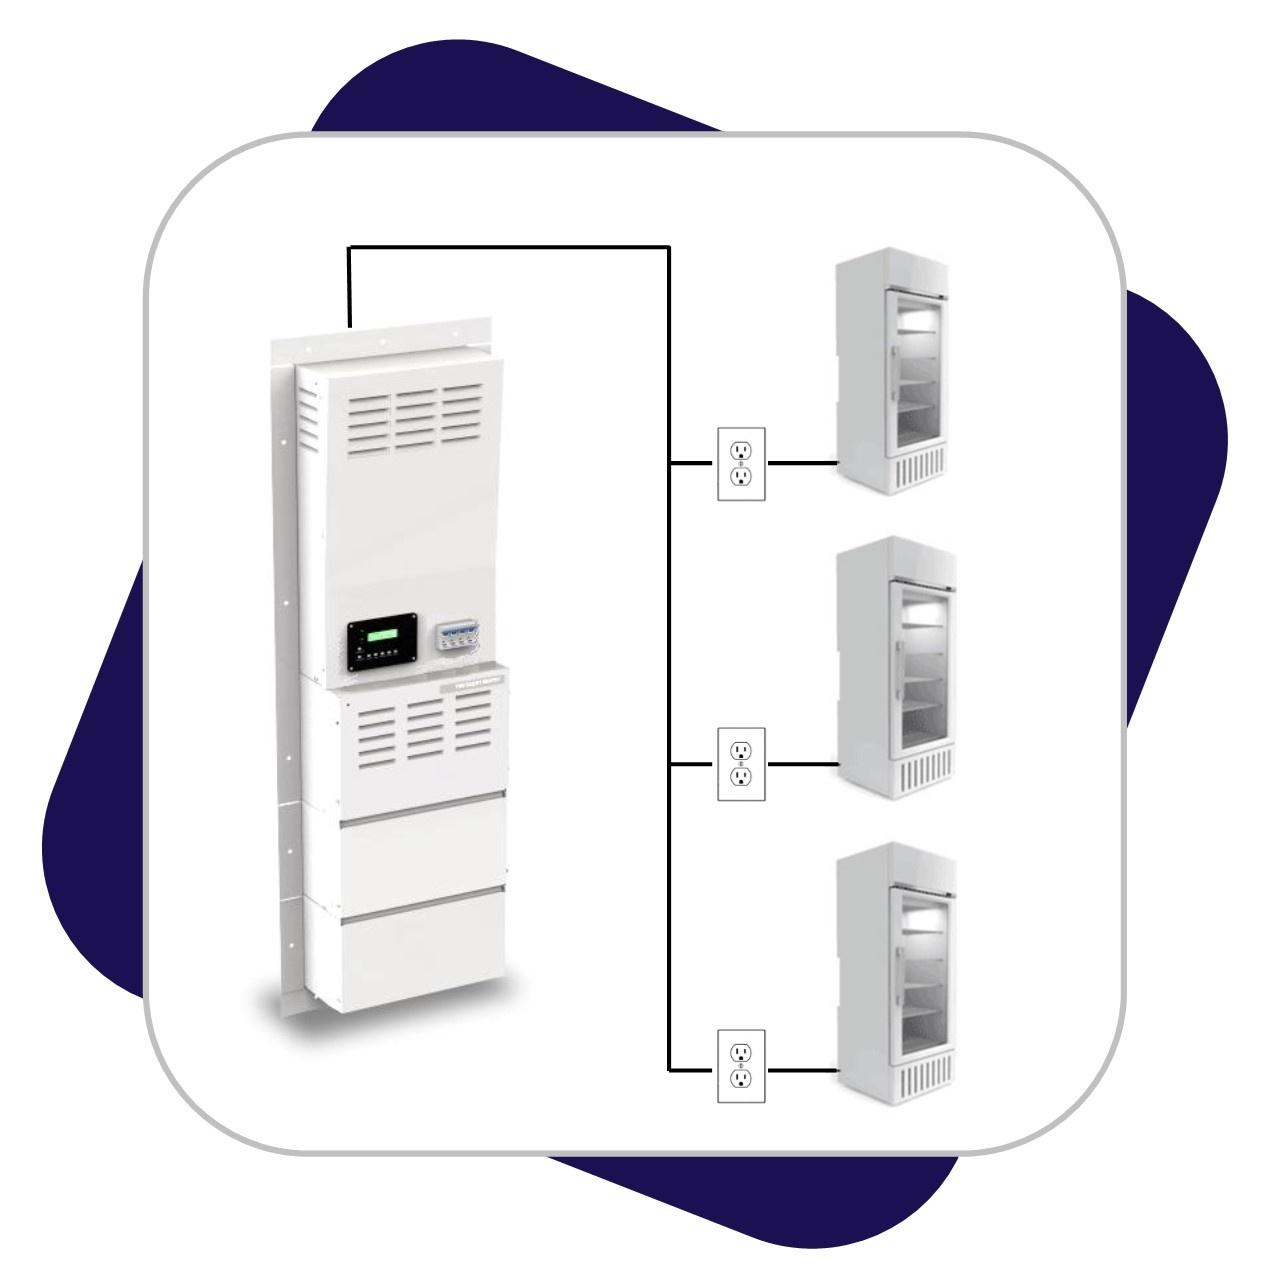 Hardwire Refridgerator Battery Backup System